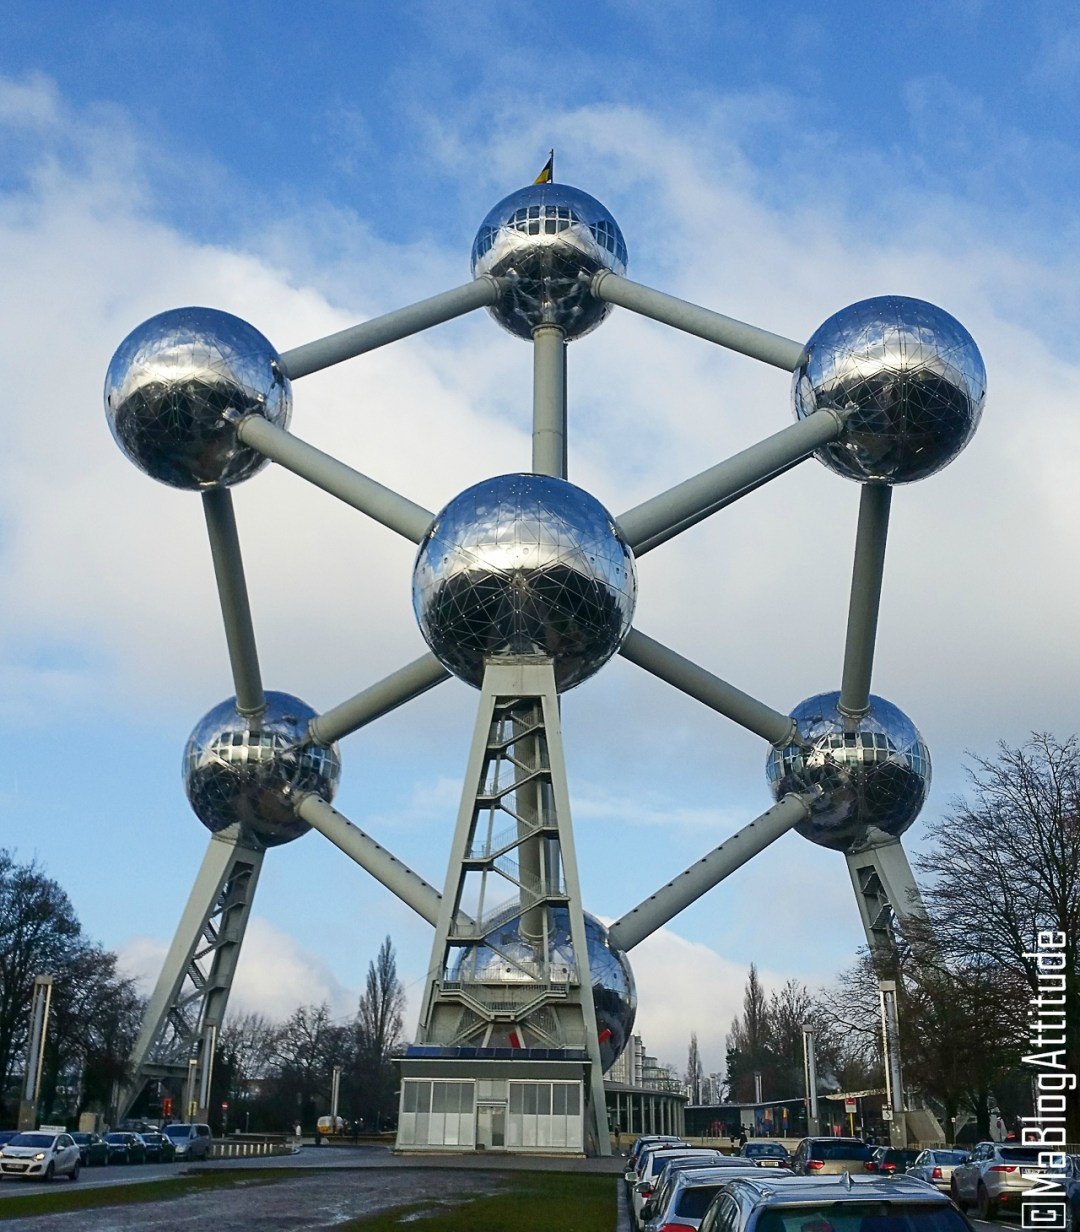 Atomium, symbole de la Belgique